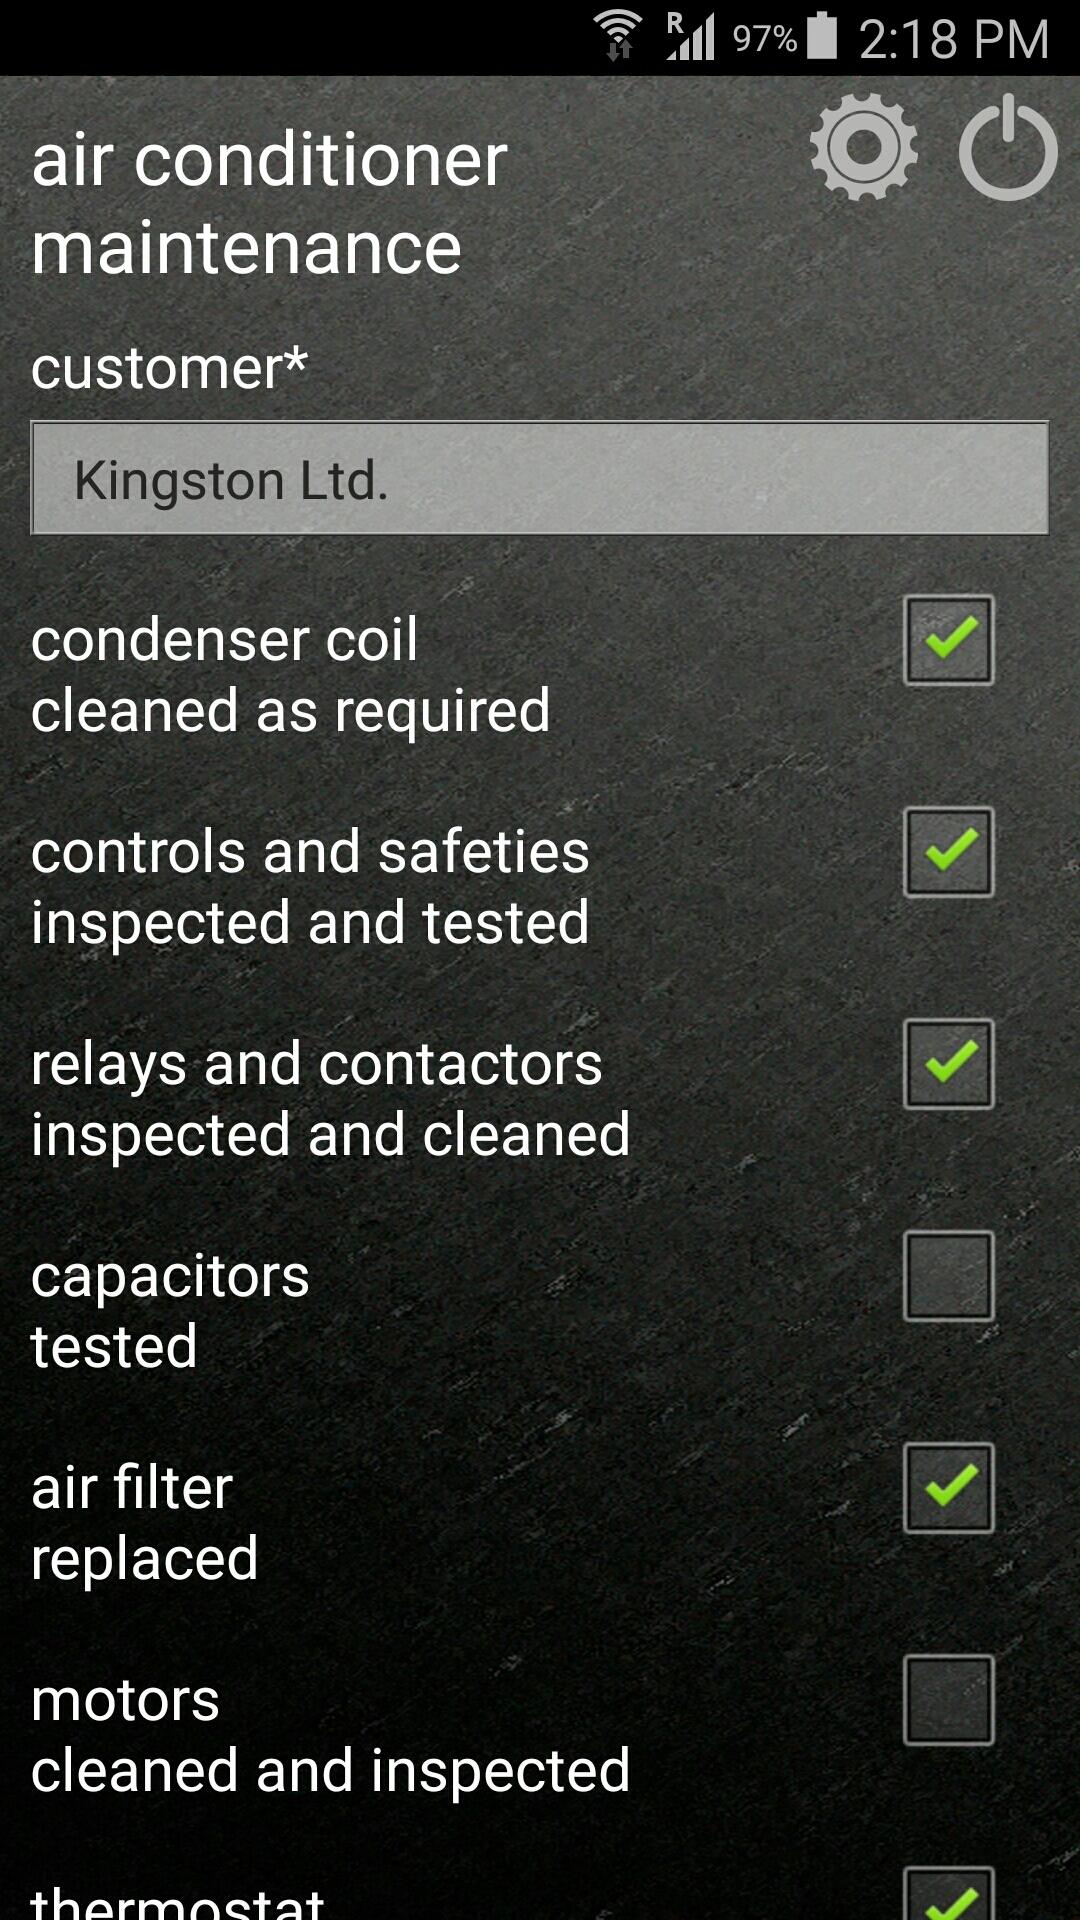 ginstr_app_airConditionerMaintenance_EN_2